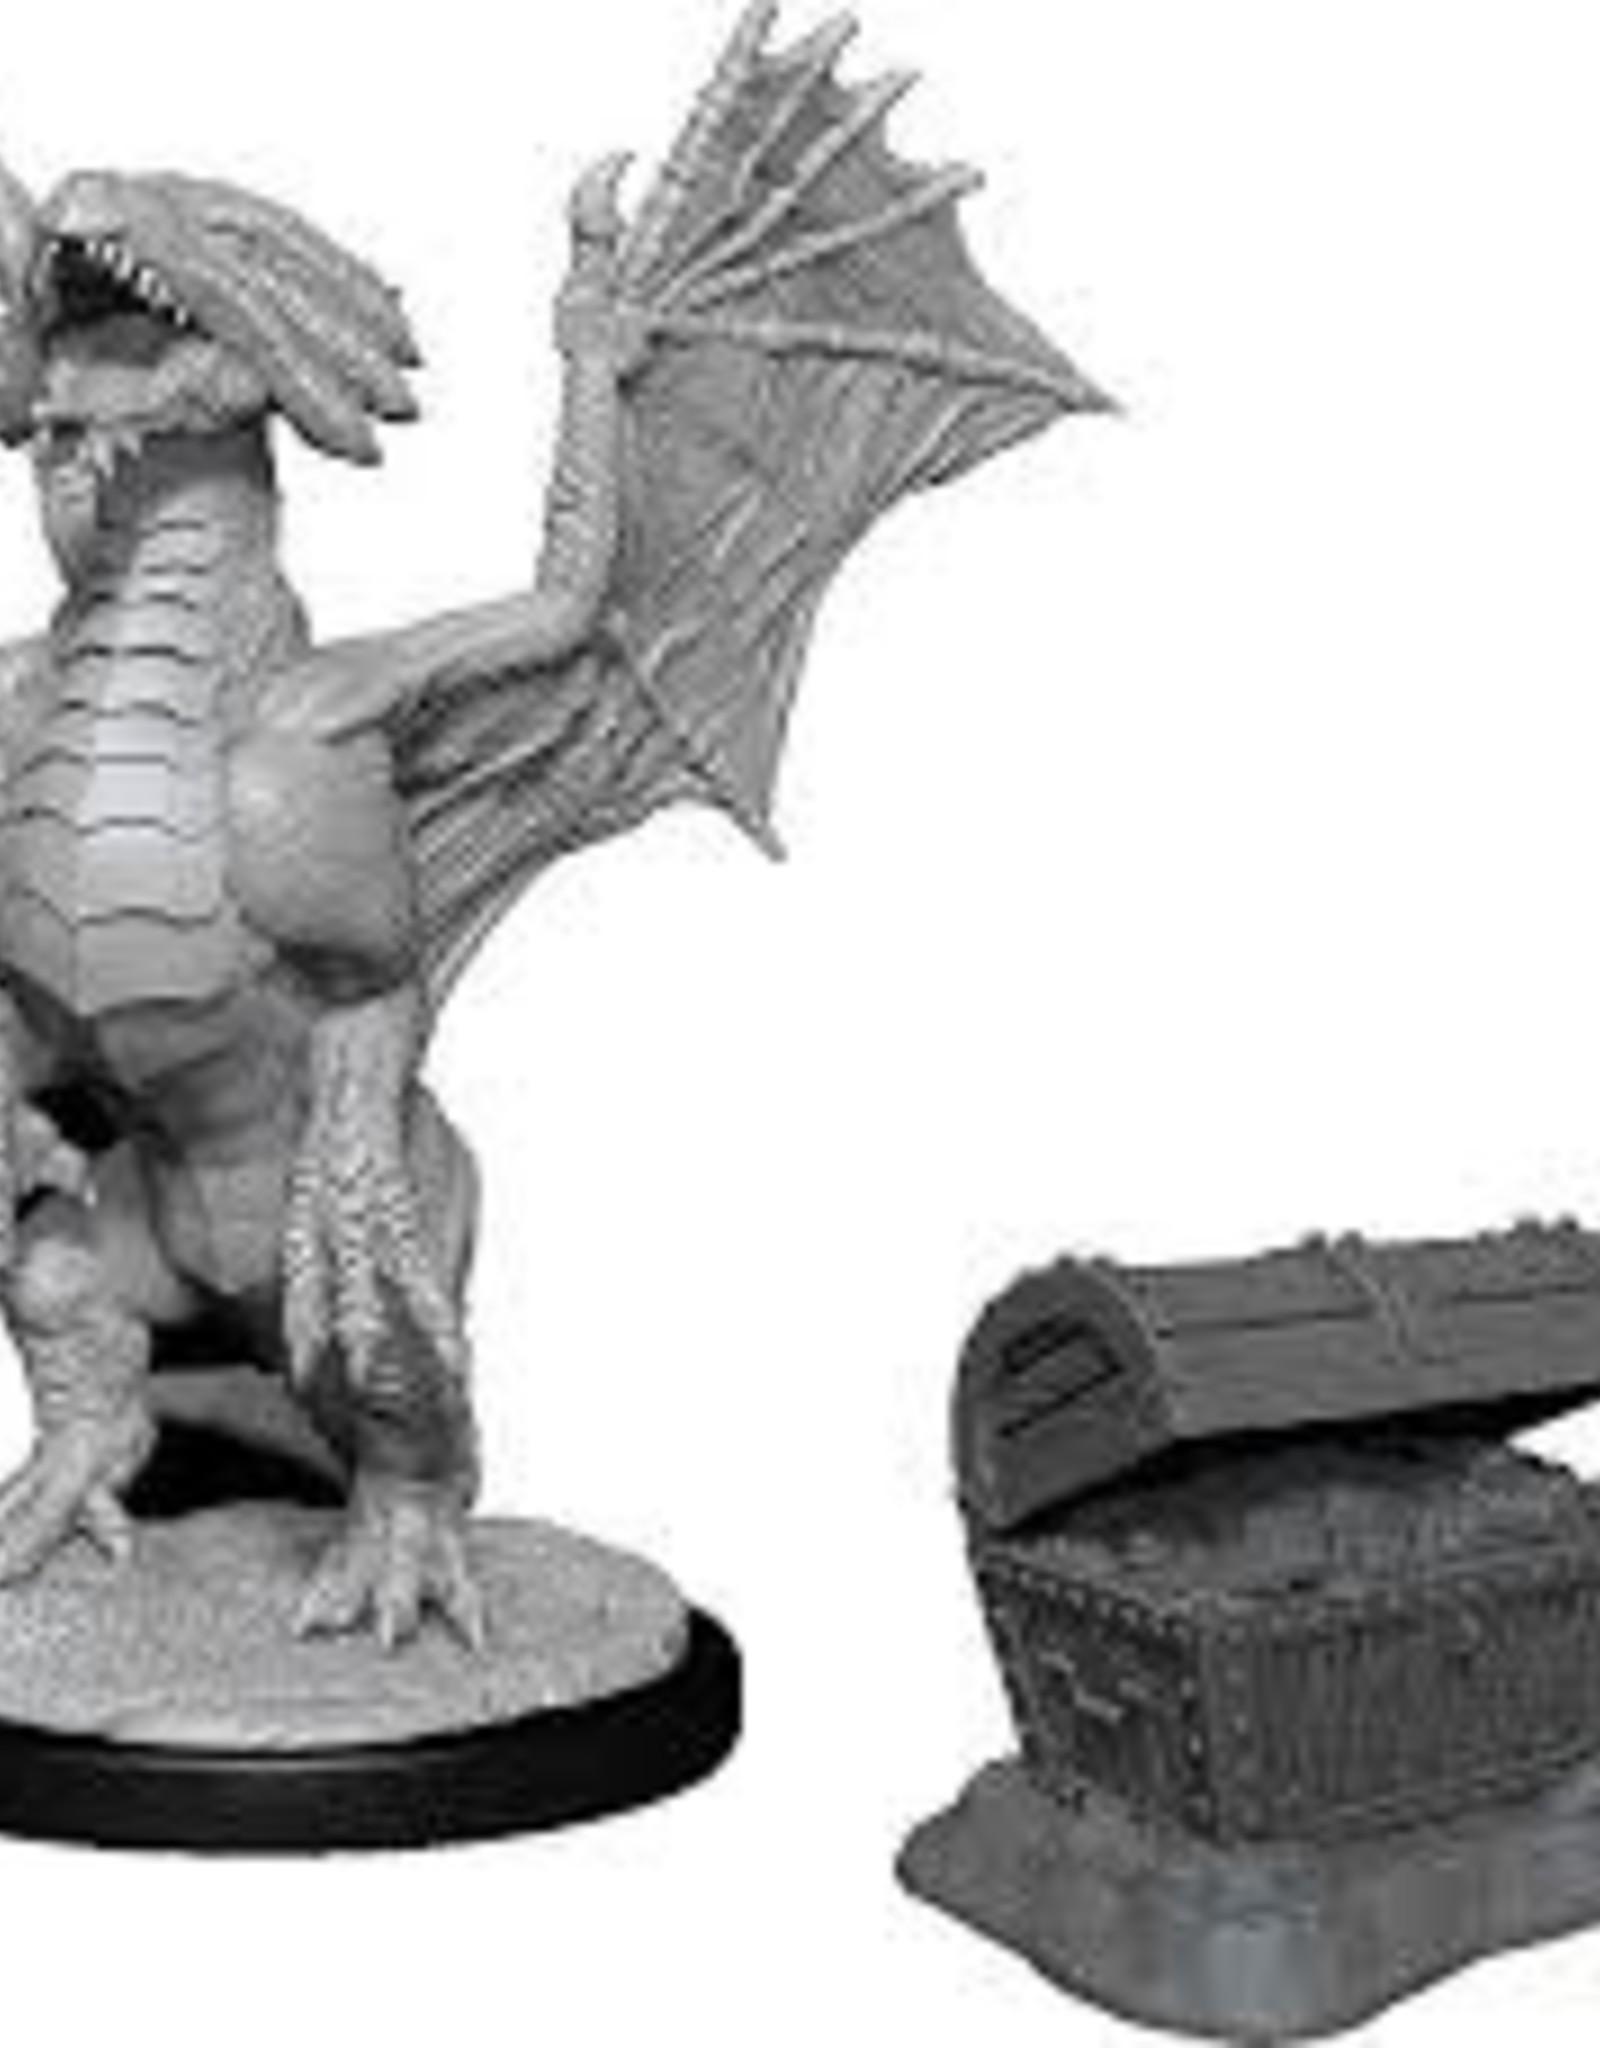 WizKids D&D Nolzur Bronzed Dragon Wyrmling & Sea Treasure